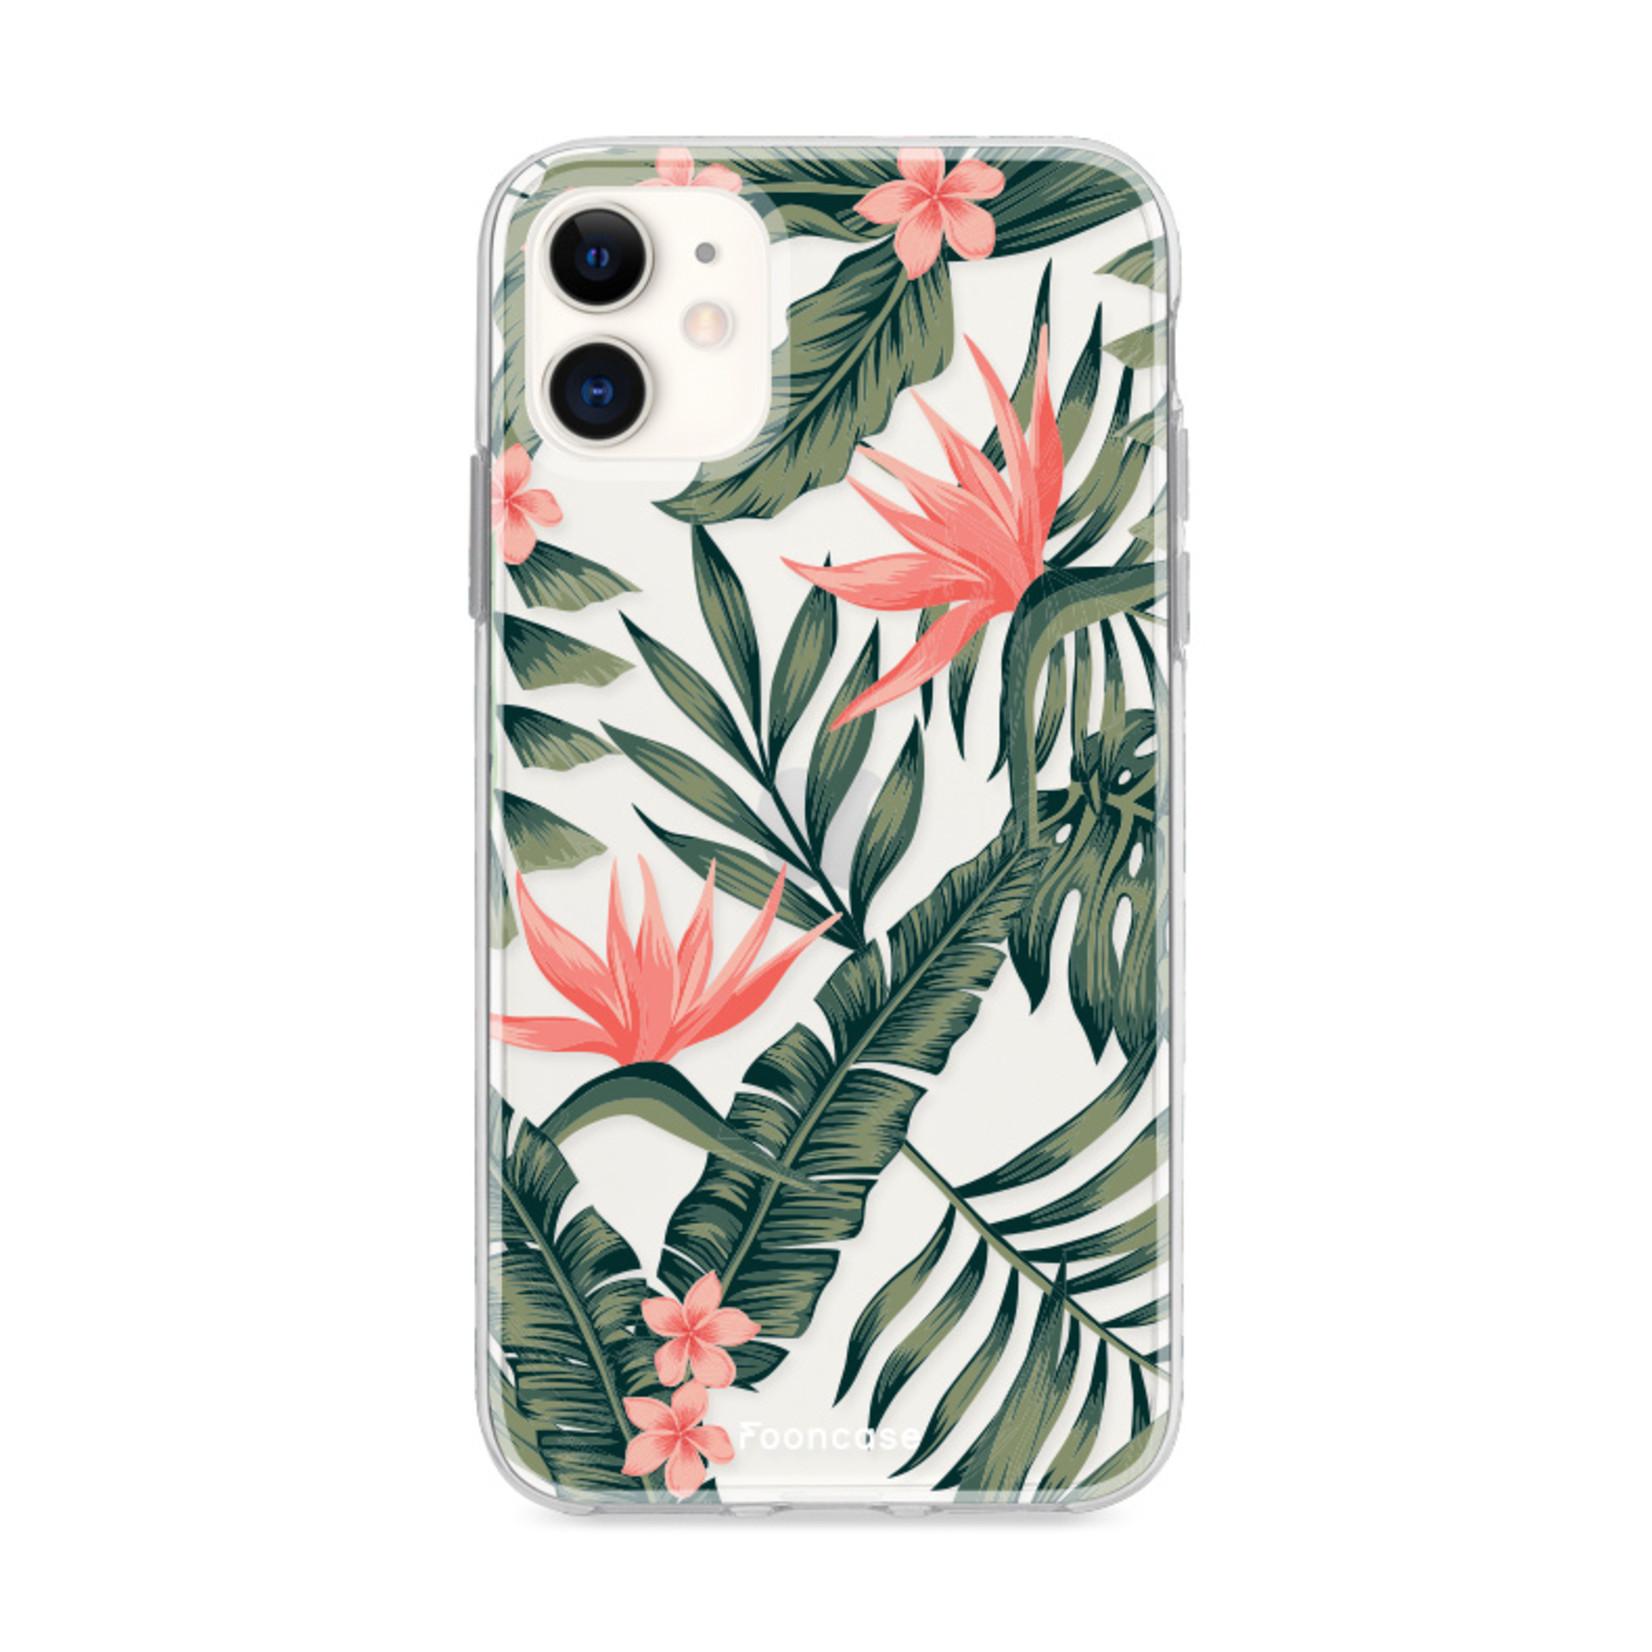 FOONCASE Iphone 11 Handyhülle - Tropical Desire